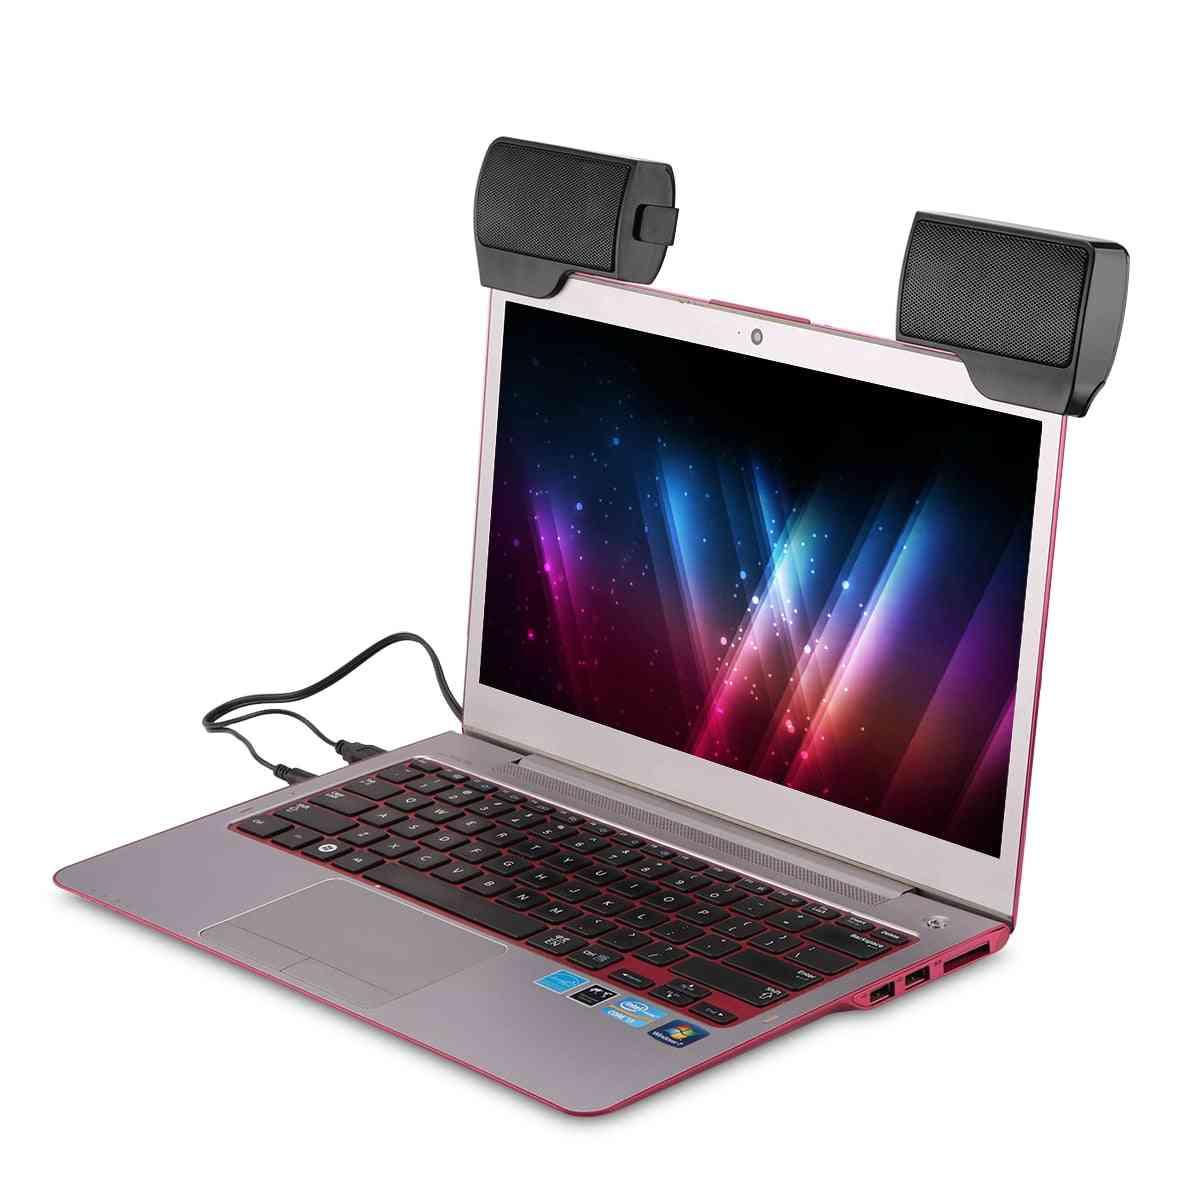 Mini Stereo Speaker, Portable Usb Multimedia Computer Soundbar For Laptop